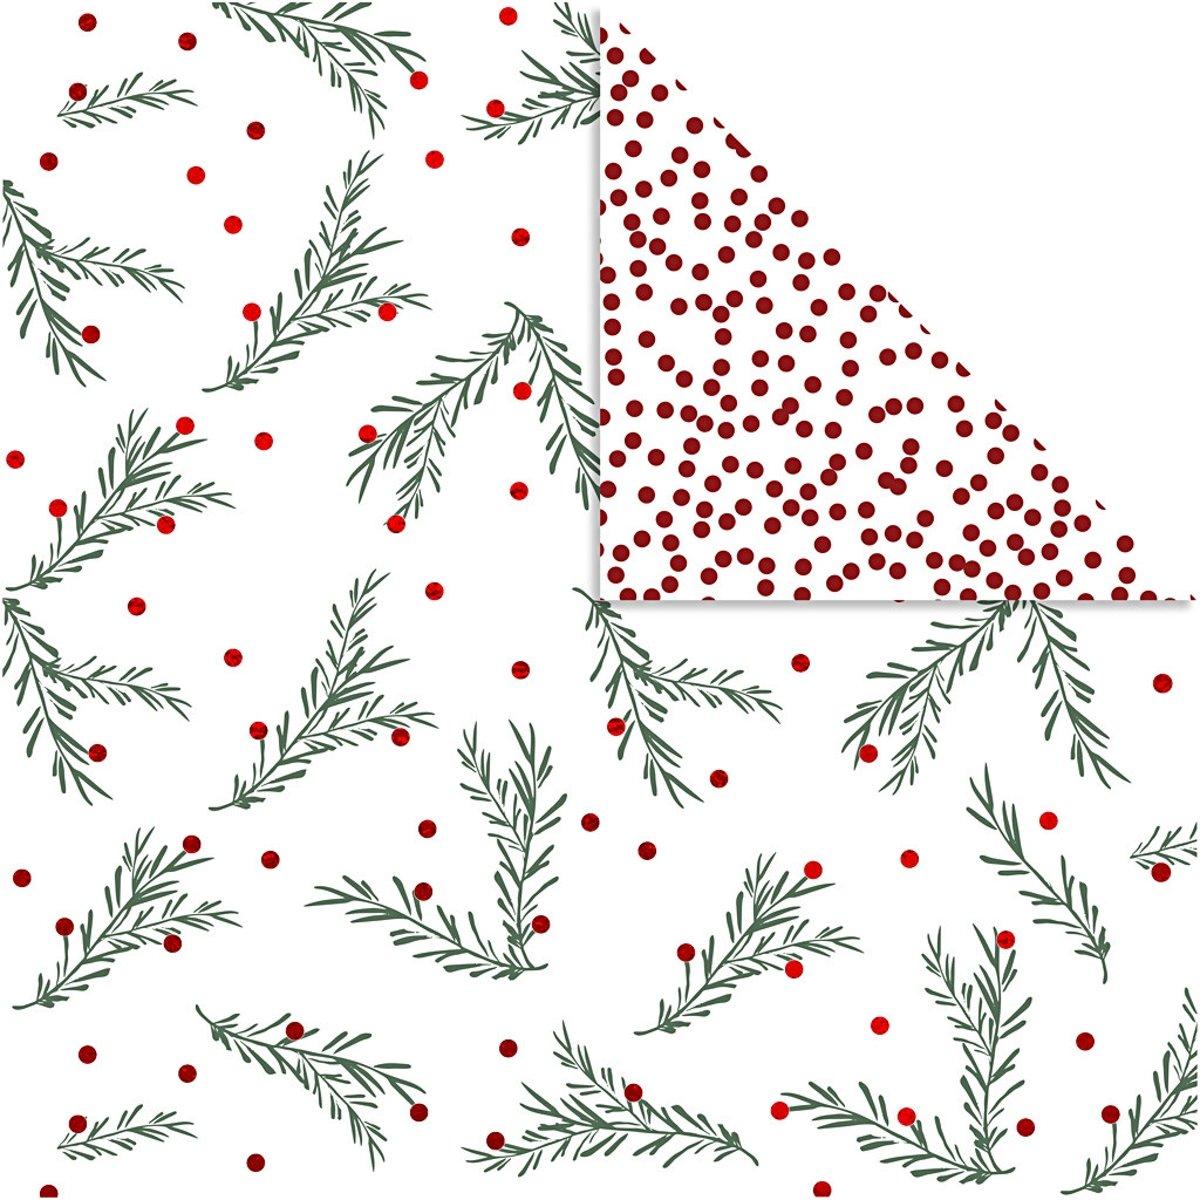 Design papier, vel 30,5x30,5 cm,  180 gr, groen, wit, goud, rood, tak en stippen, 3vellen [HOB-25338] kopen